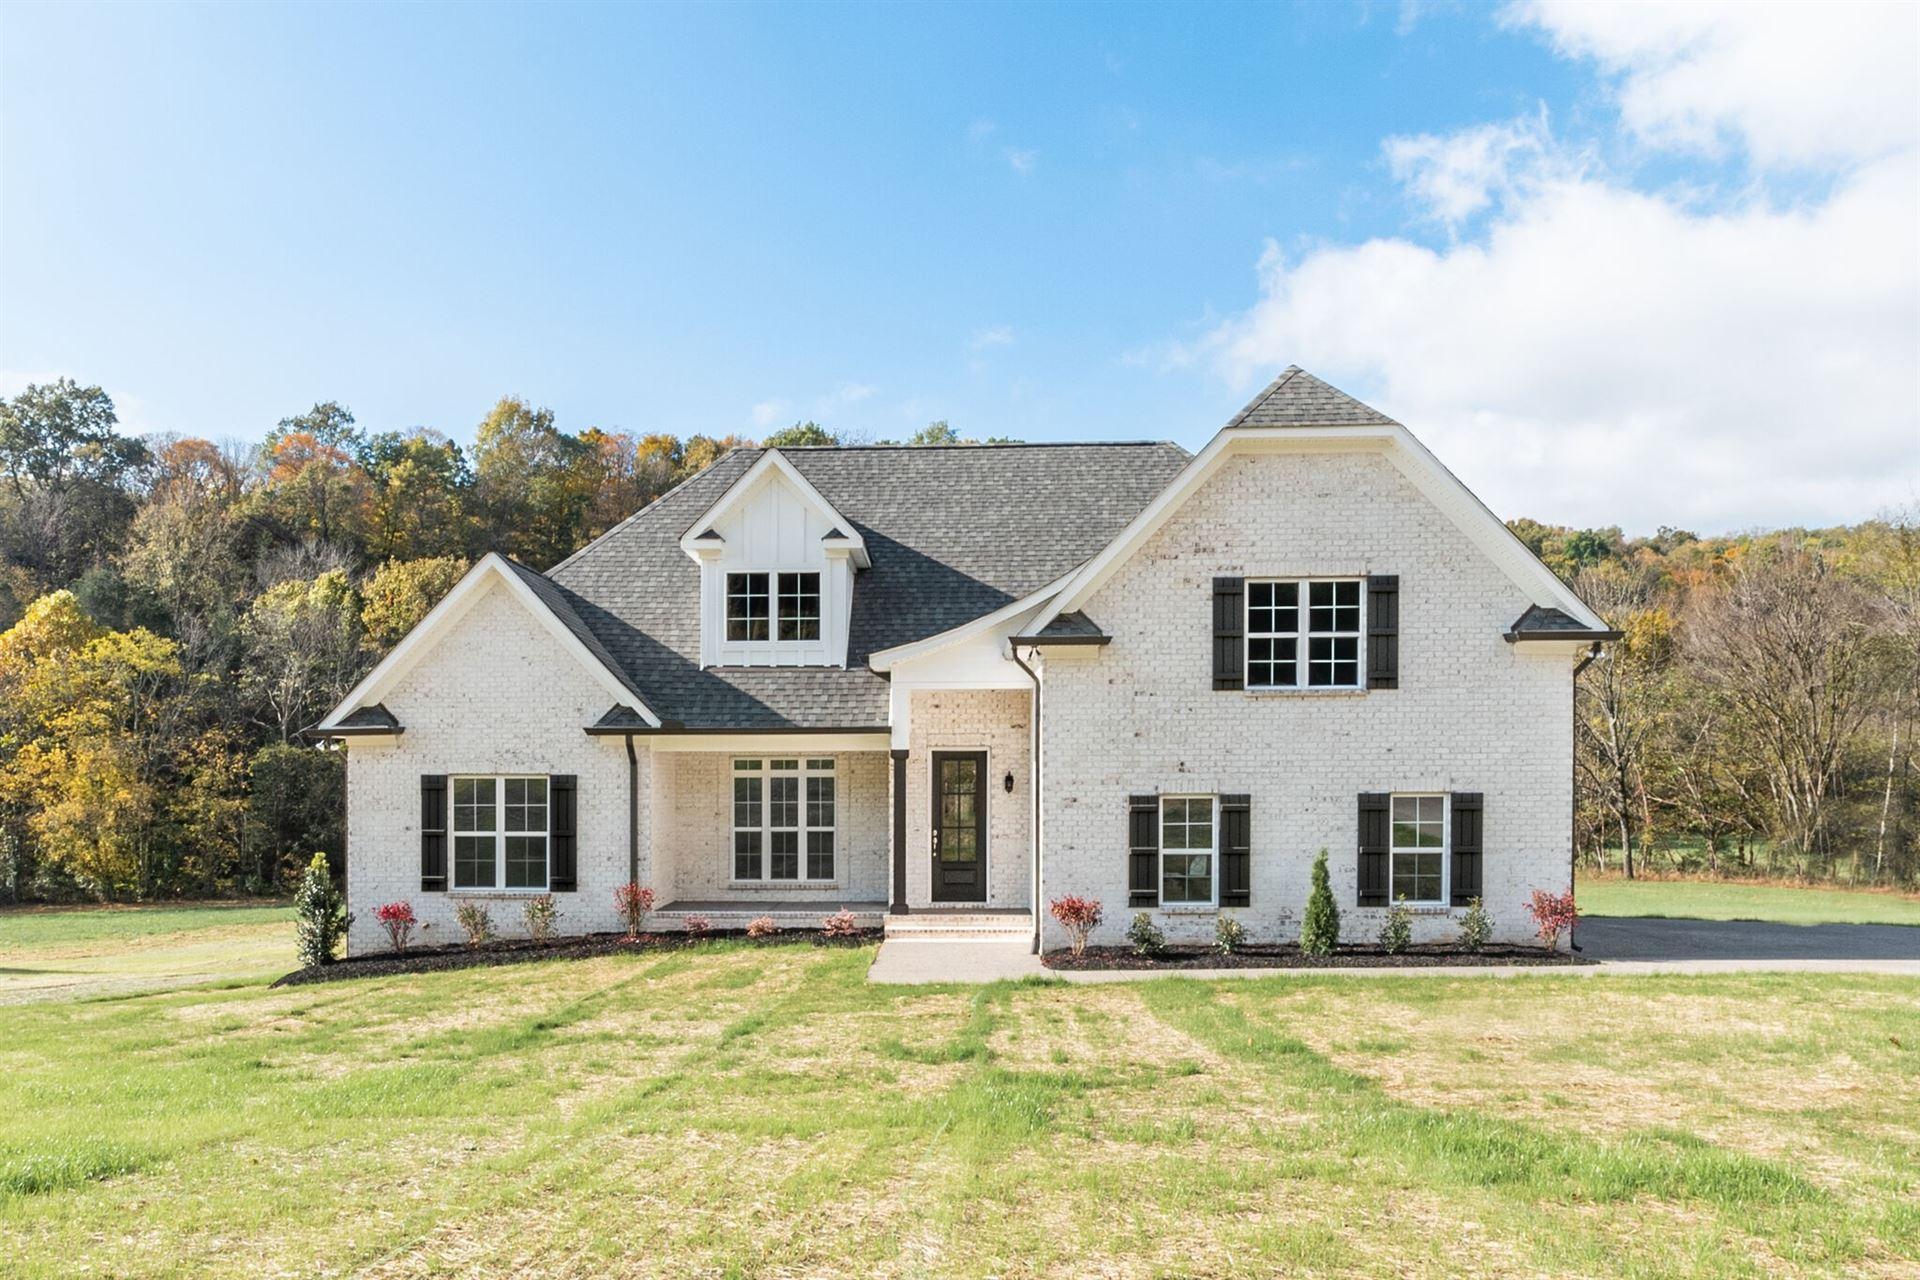 450 Johnson Hollow Rd, Watertown, TN 37184 - MLS#: 2299845